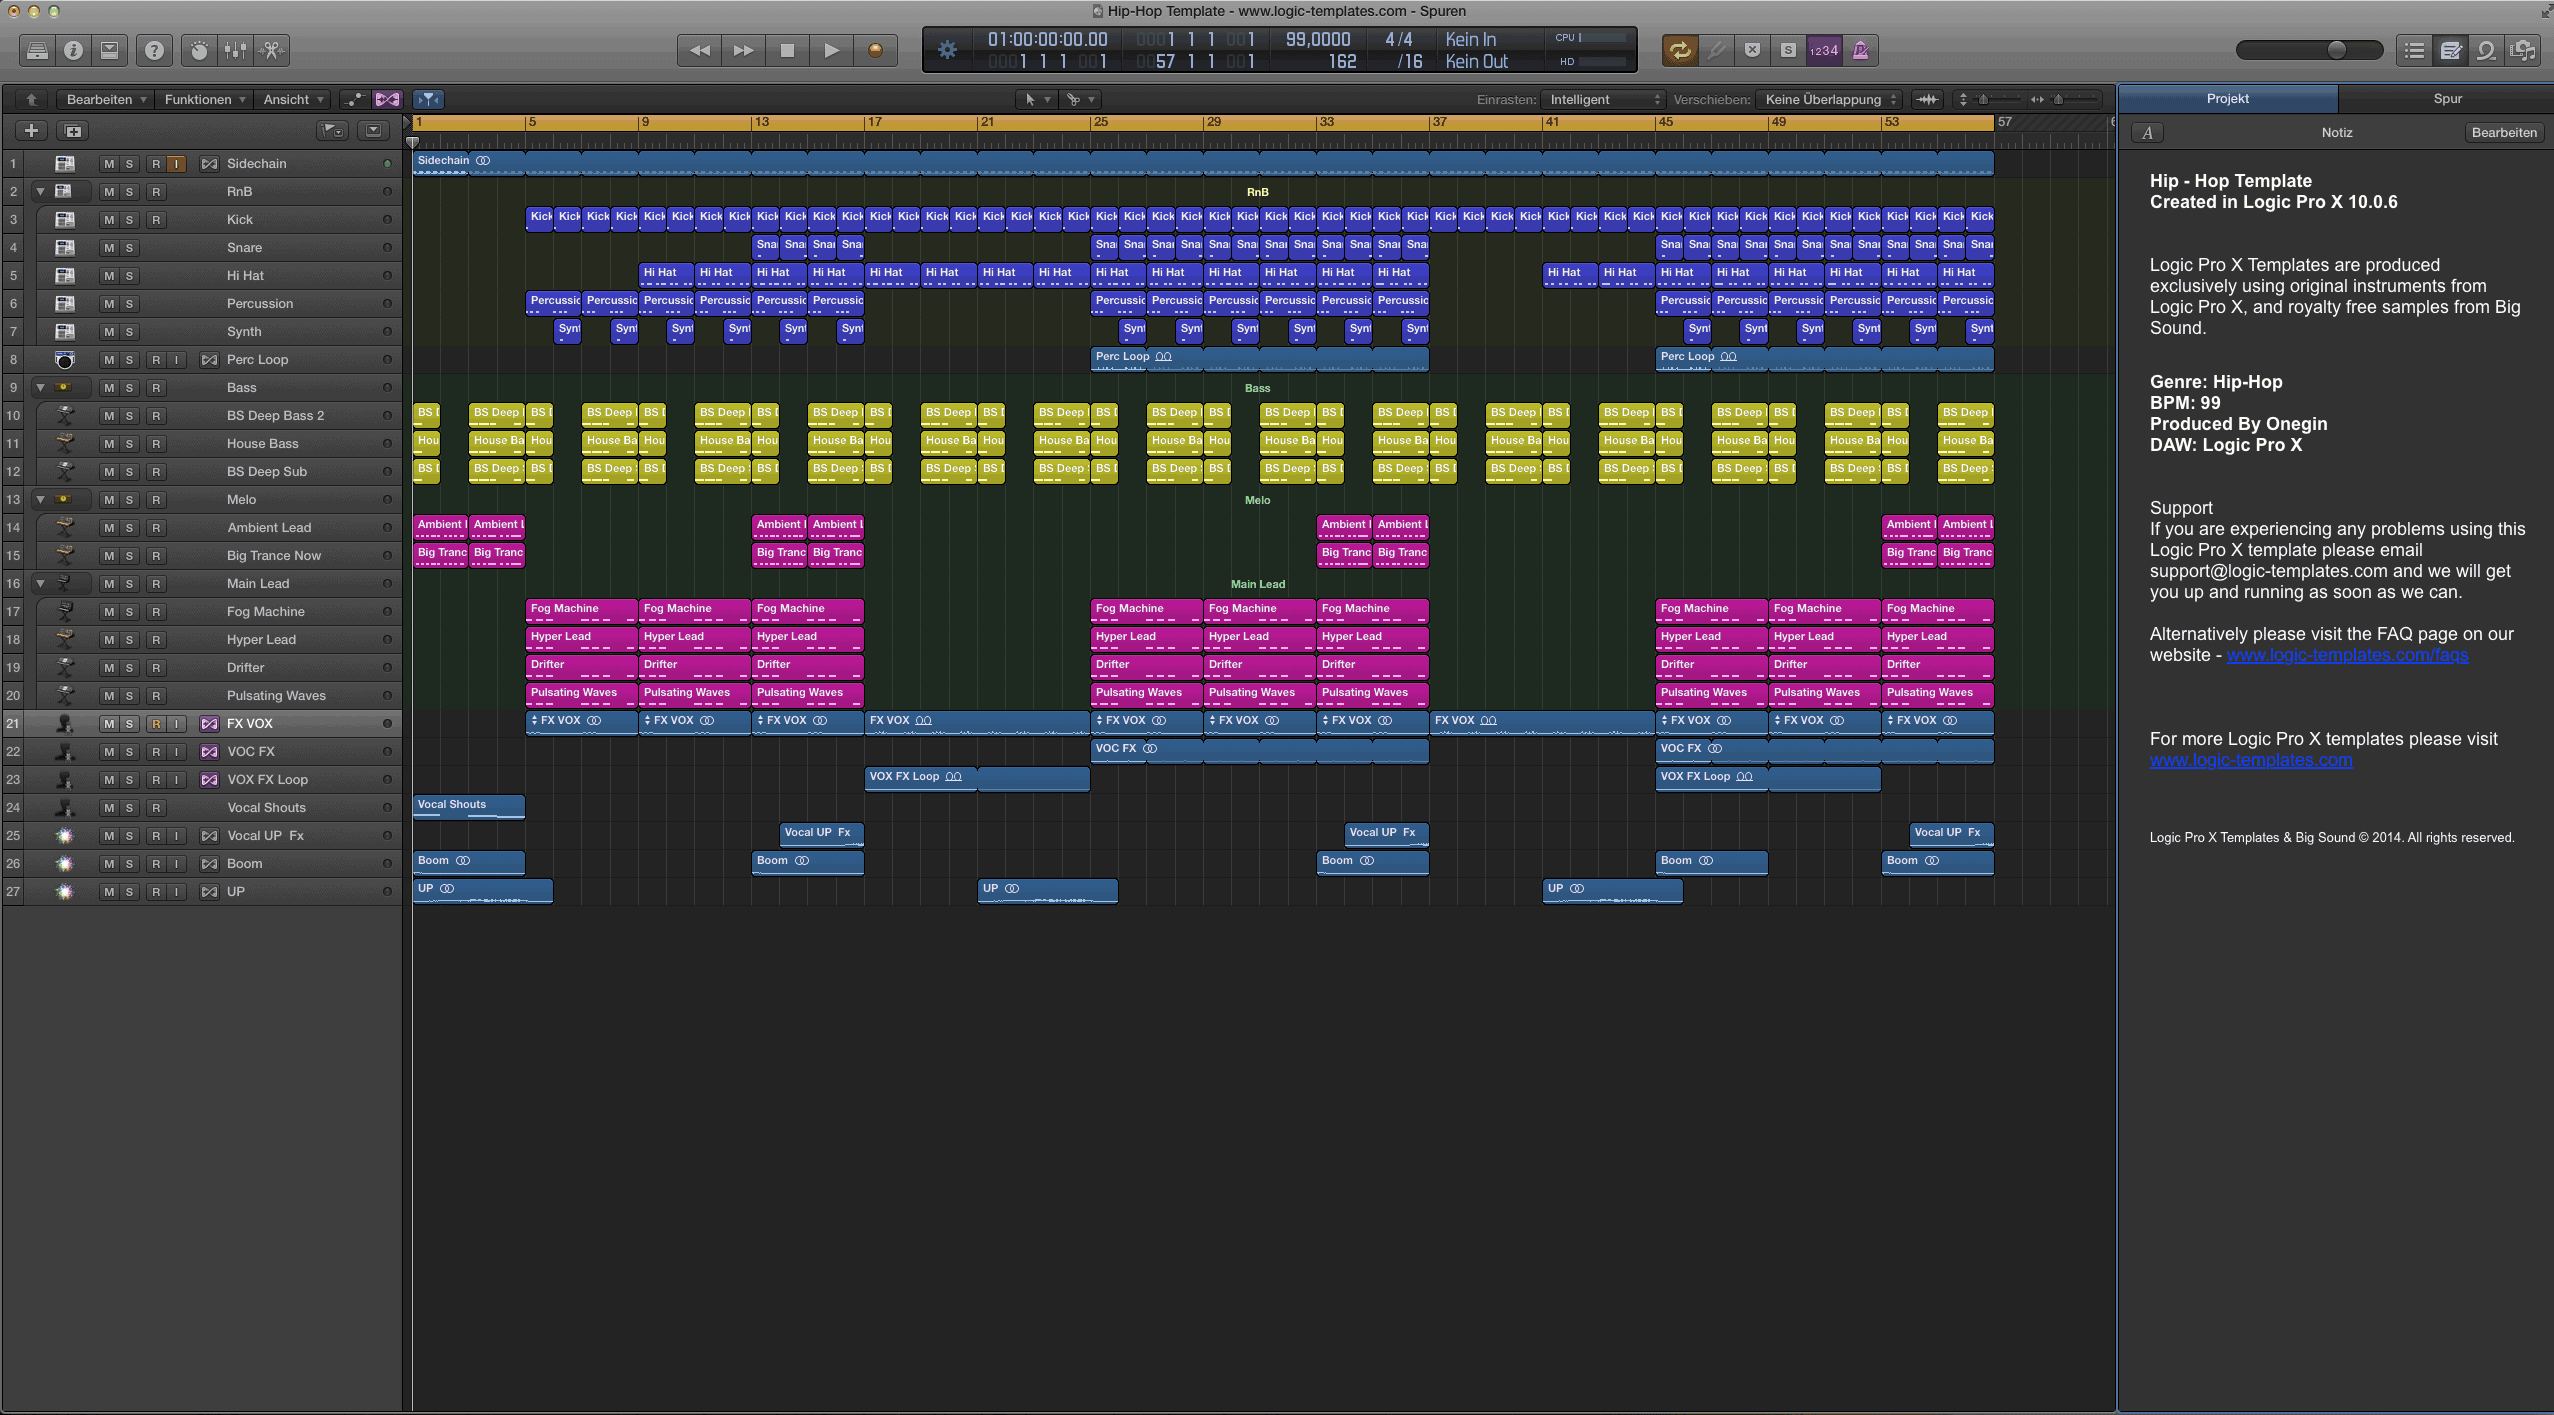 hip-hop logic pro x template